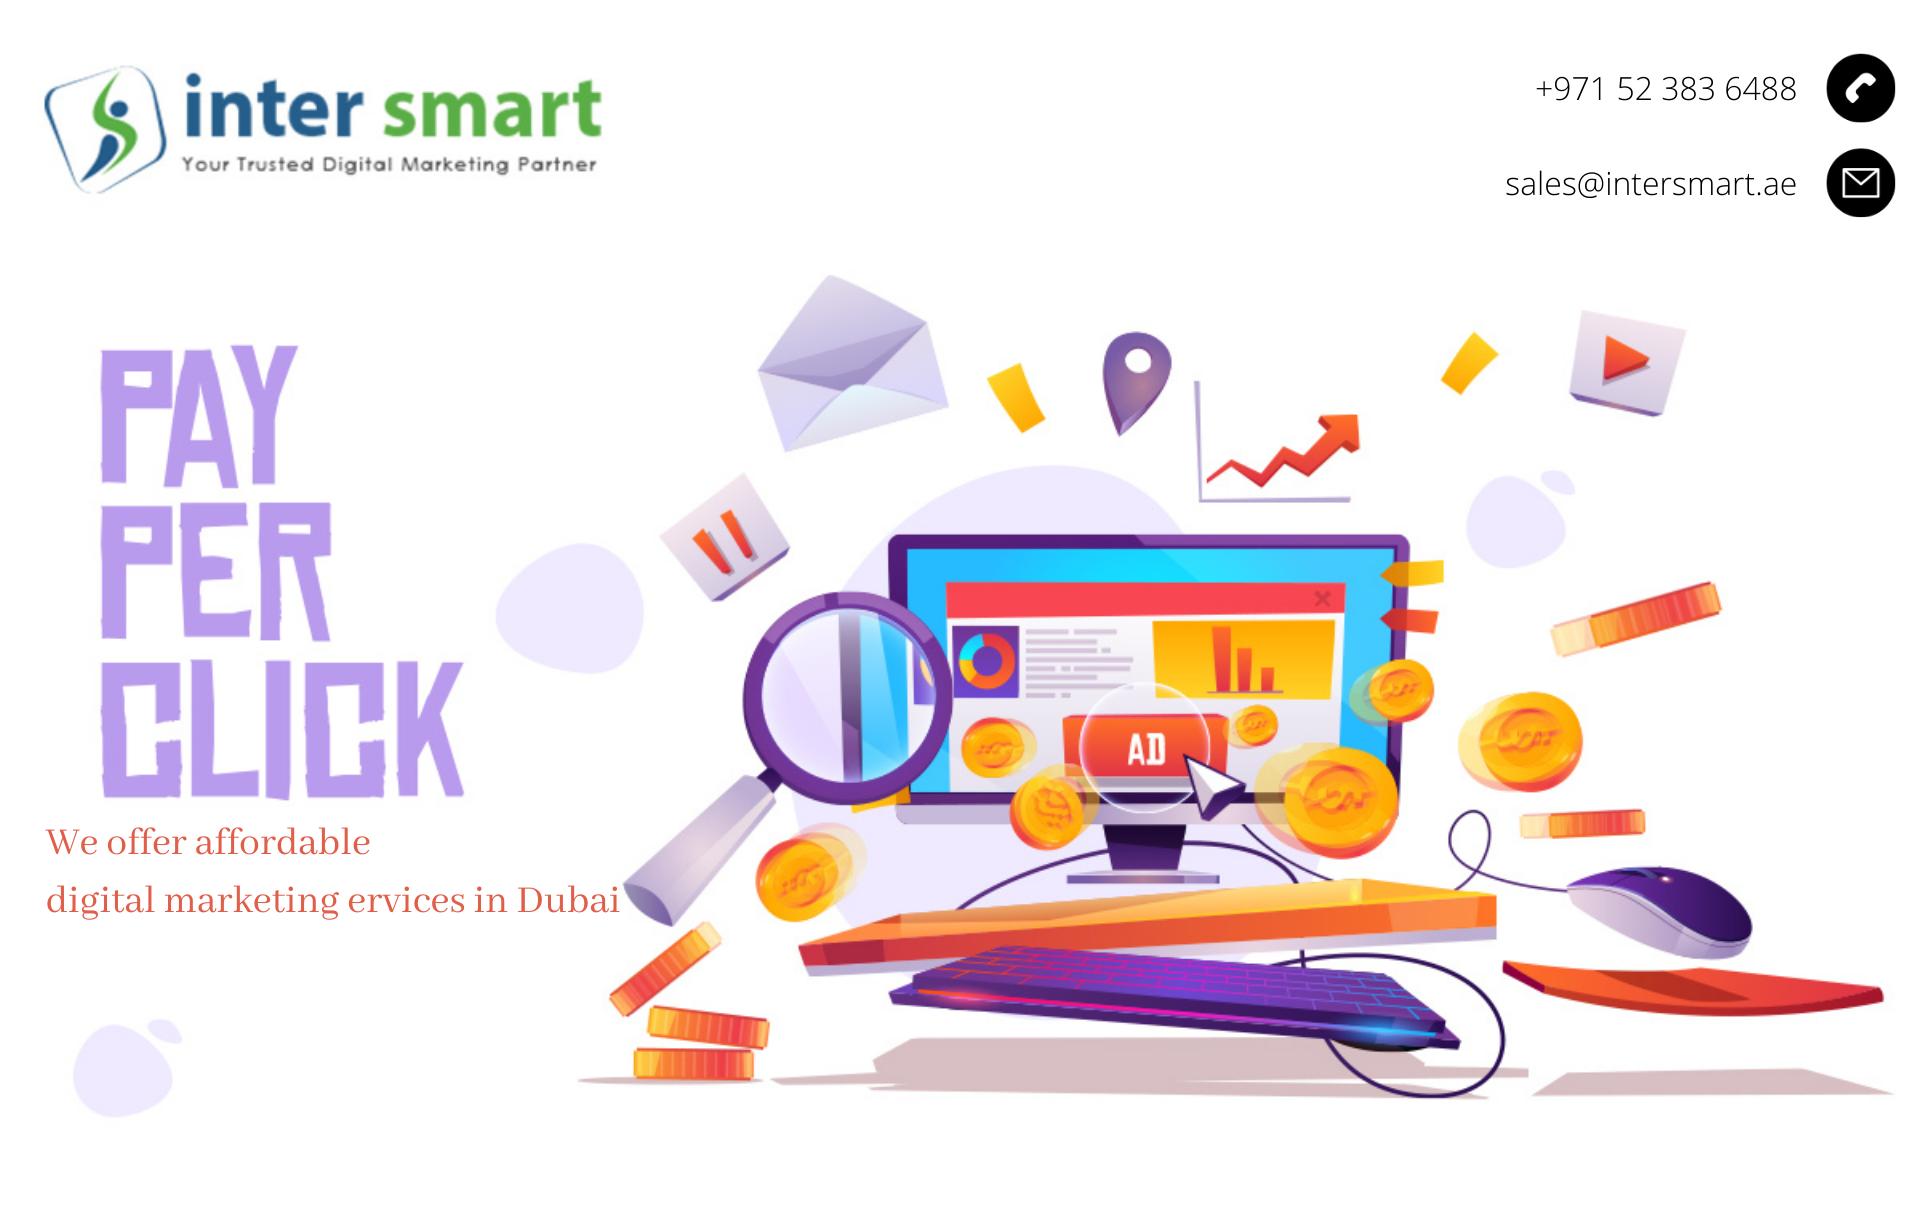 Digital Marketing Service Providers In Dubai In 2020 Digital Marketing Digital Marketing Company Web Template Design